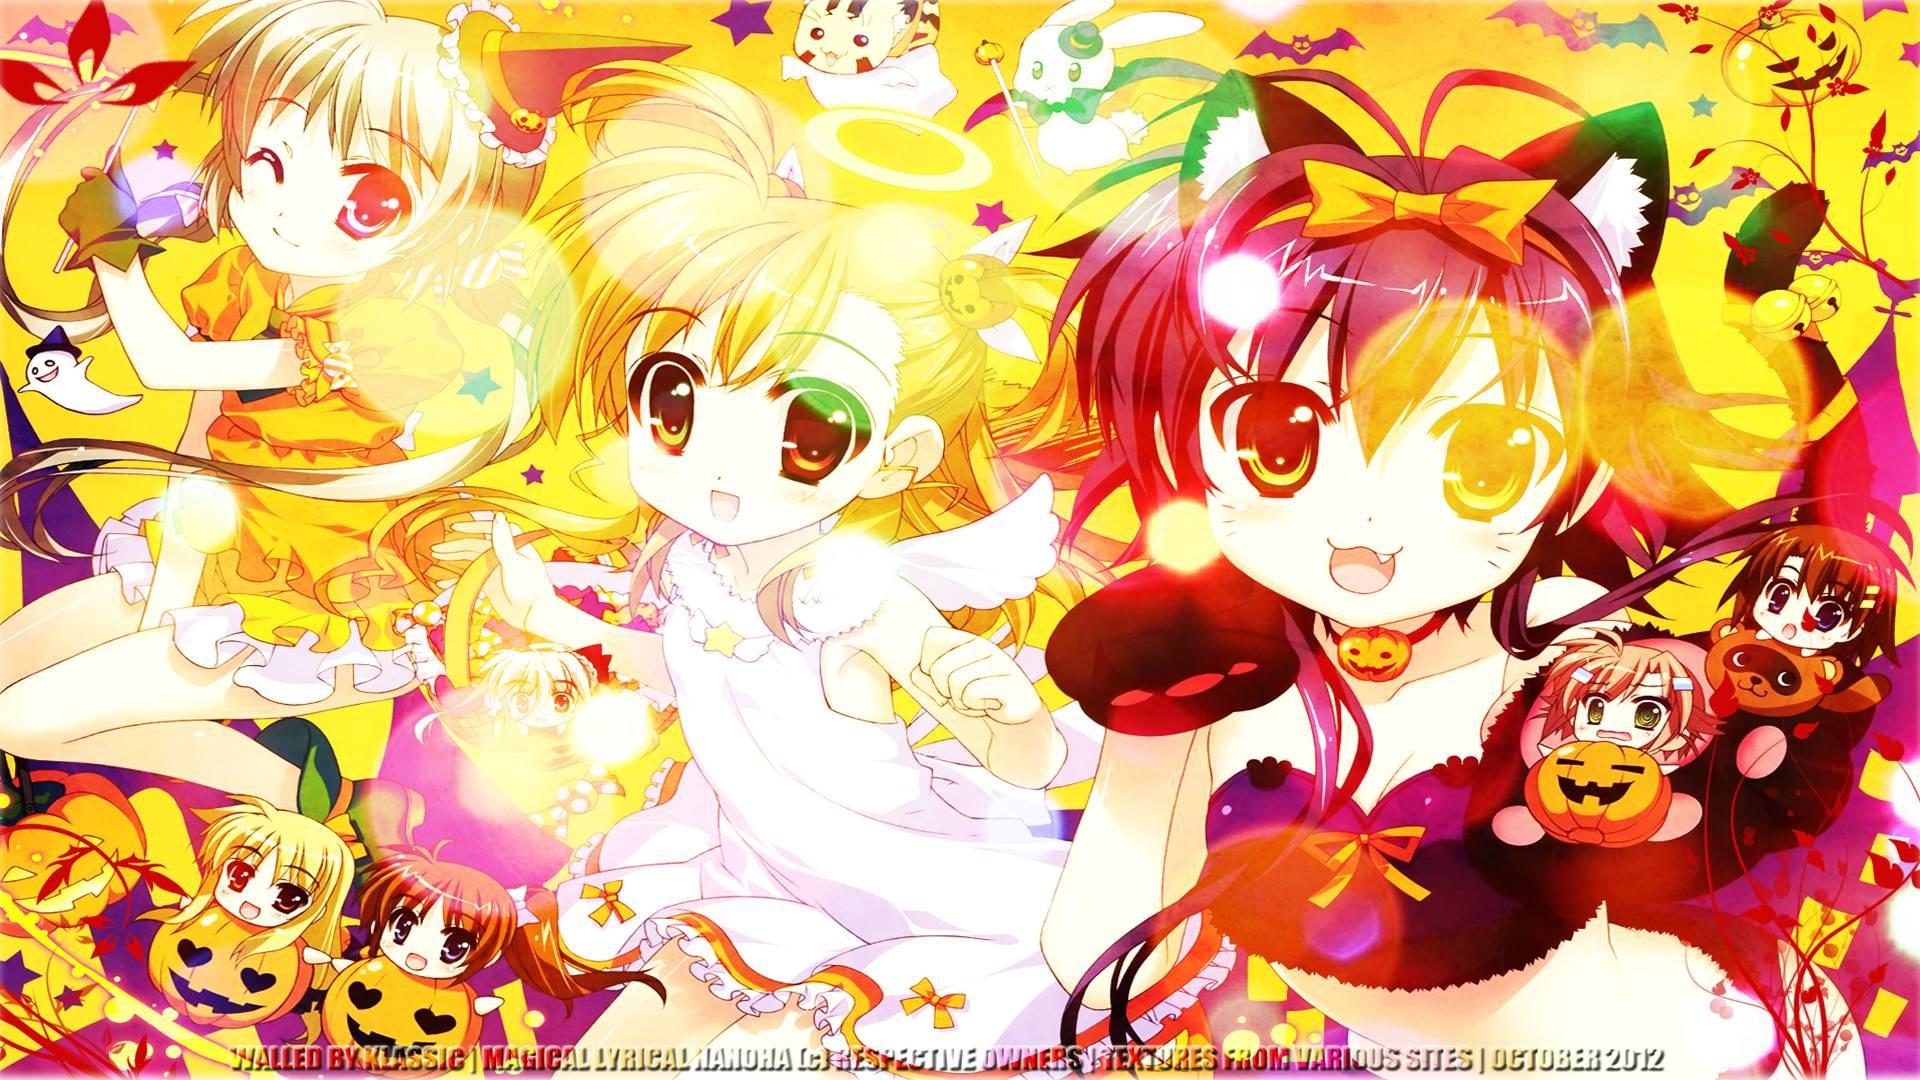 Anime Chibi Background Hd Wallpaper